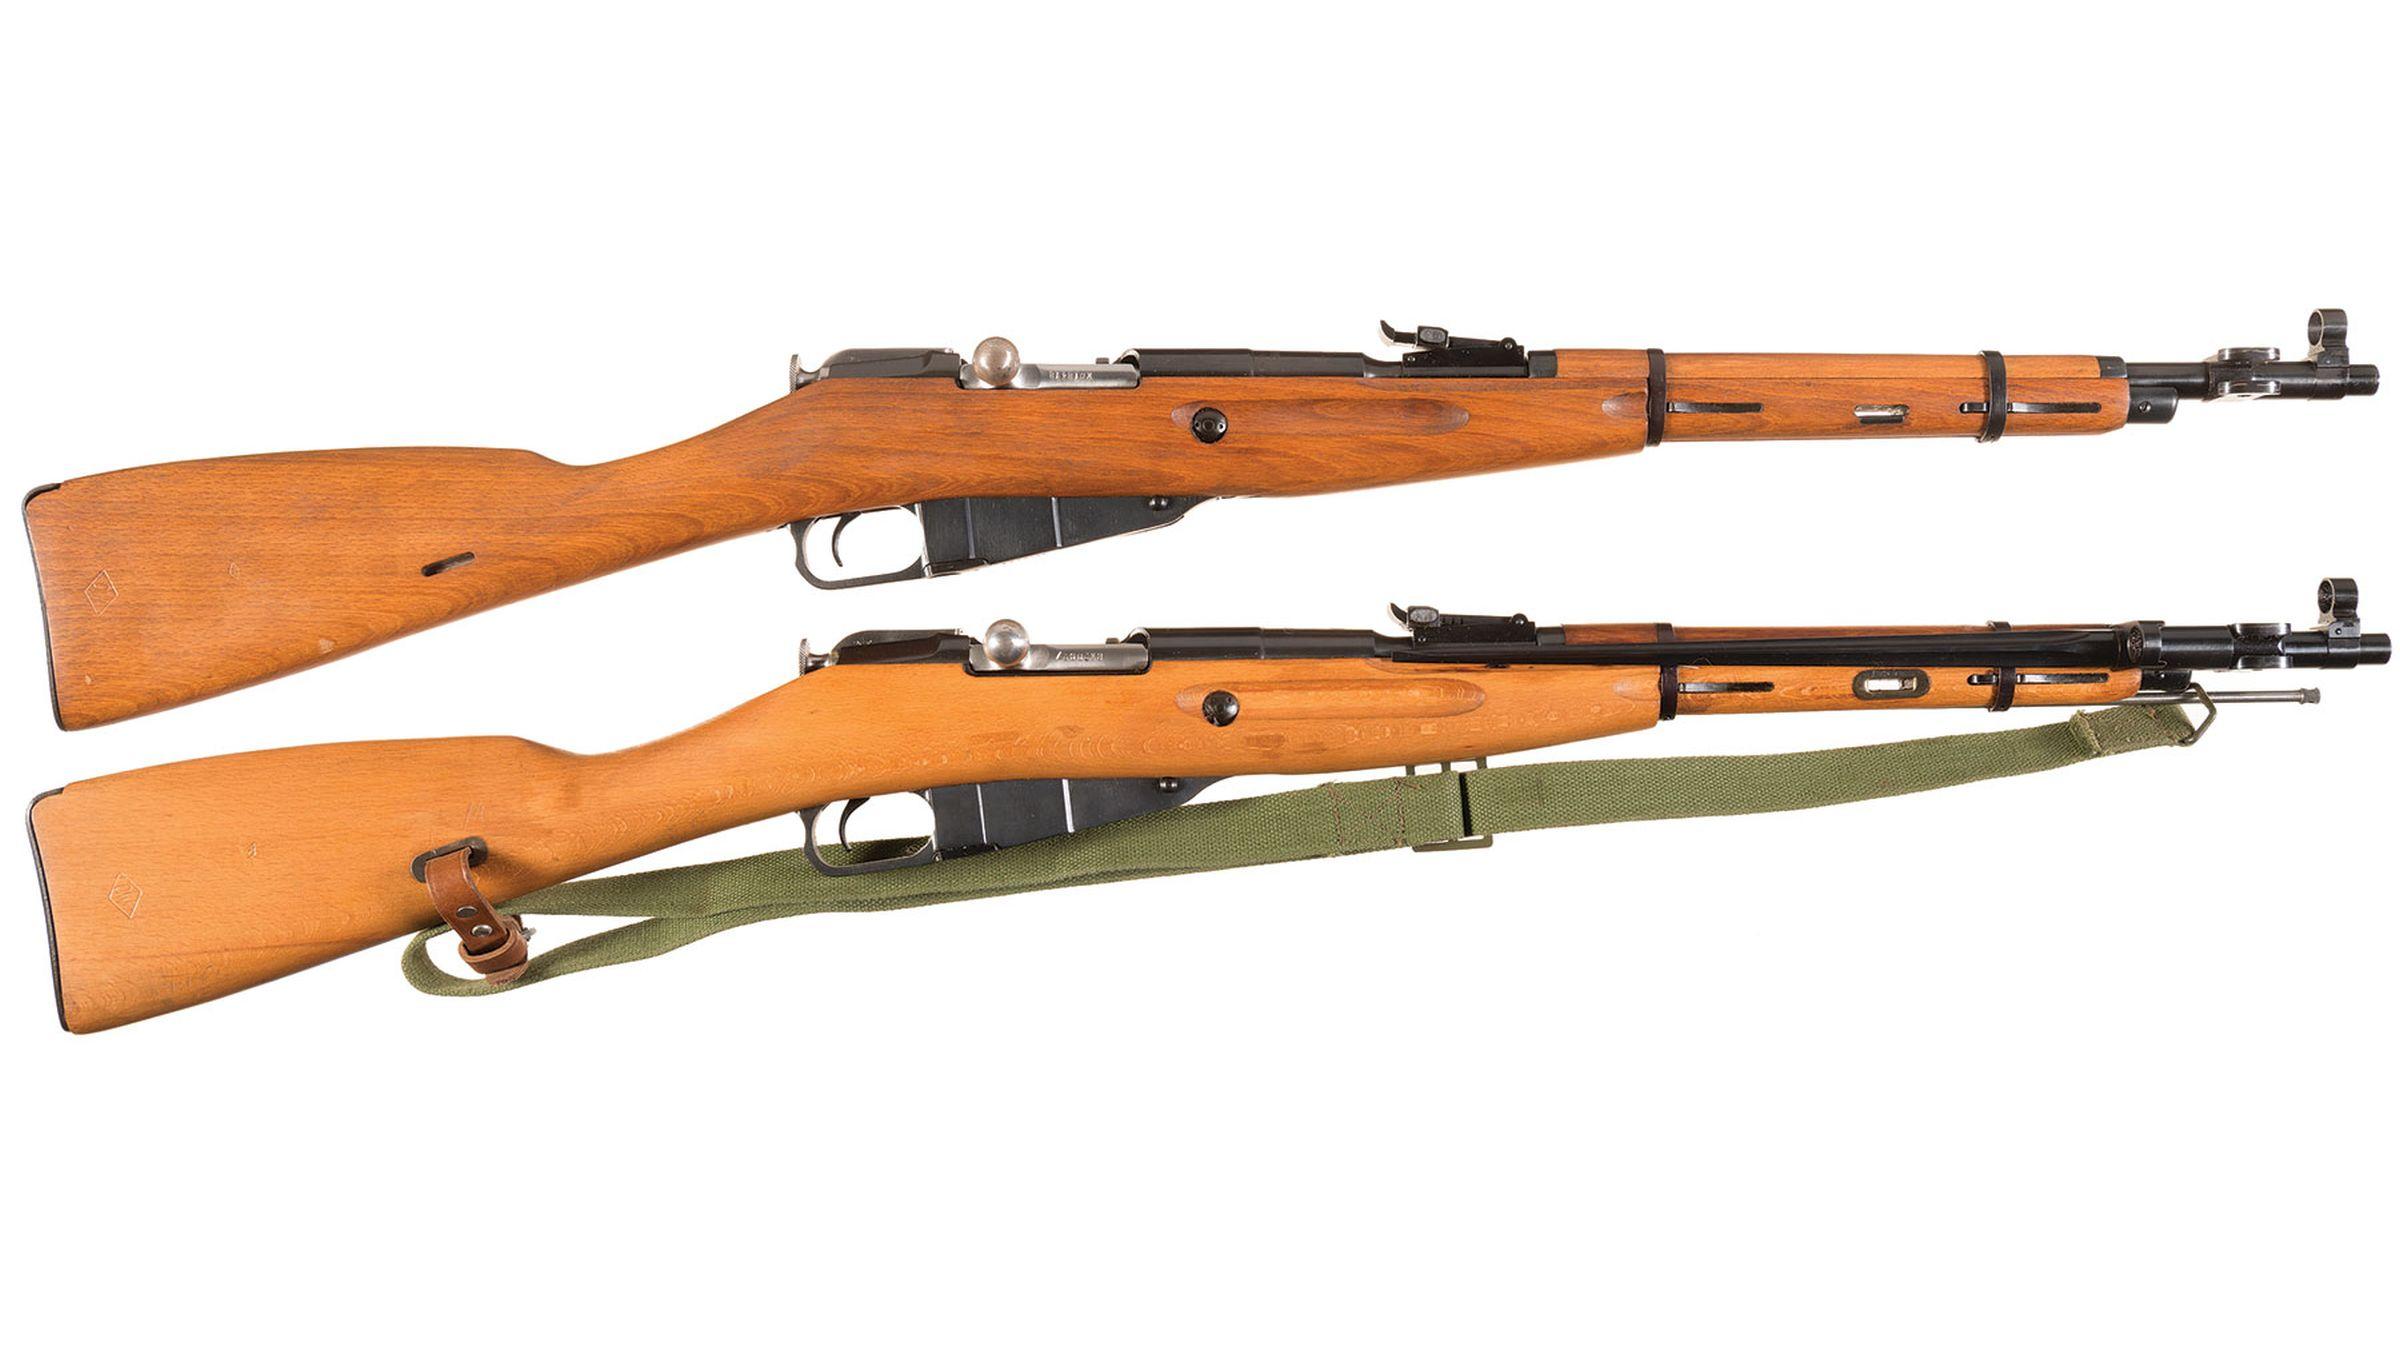 Two Polish M44 Mosin Nagant Bolt Action Carbines